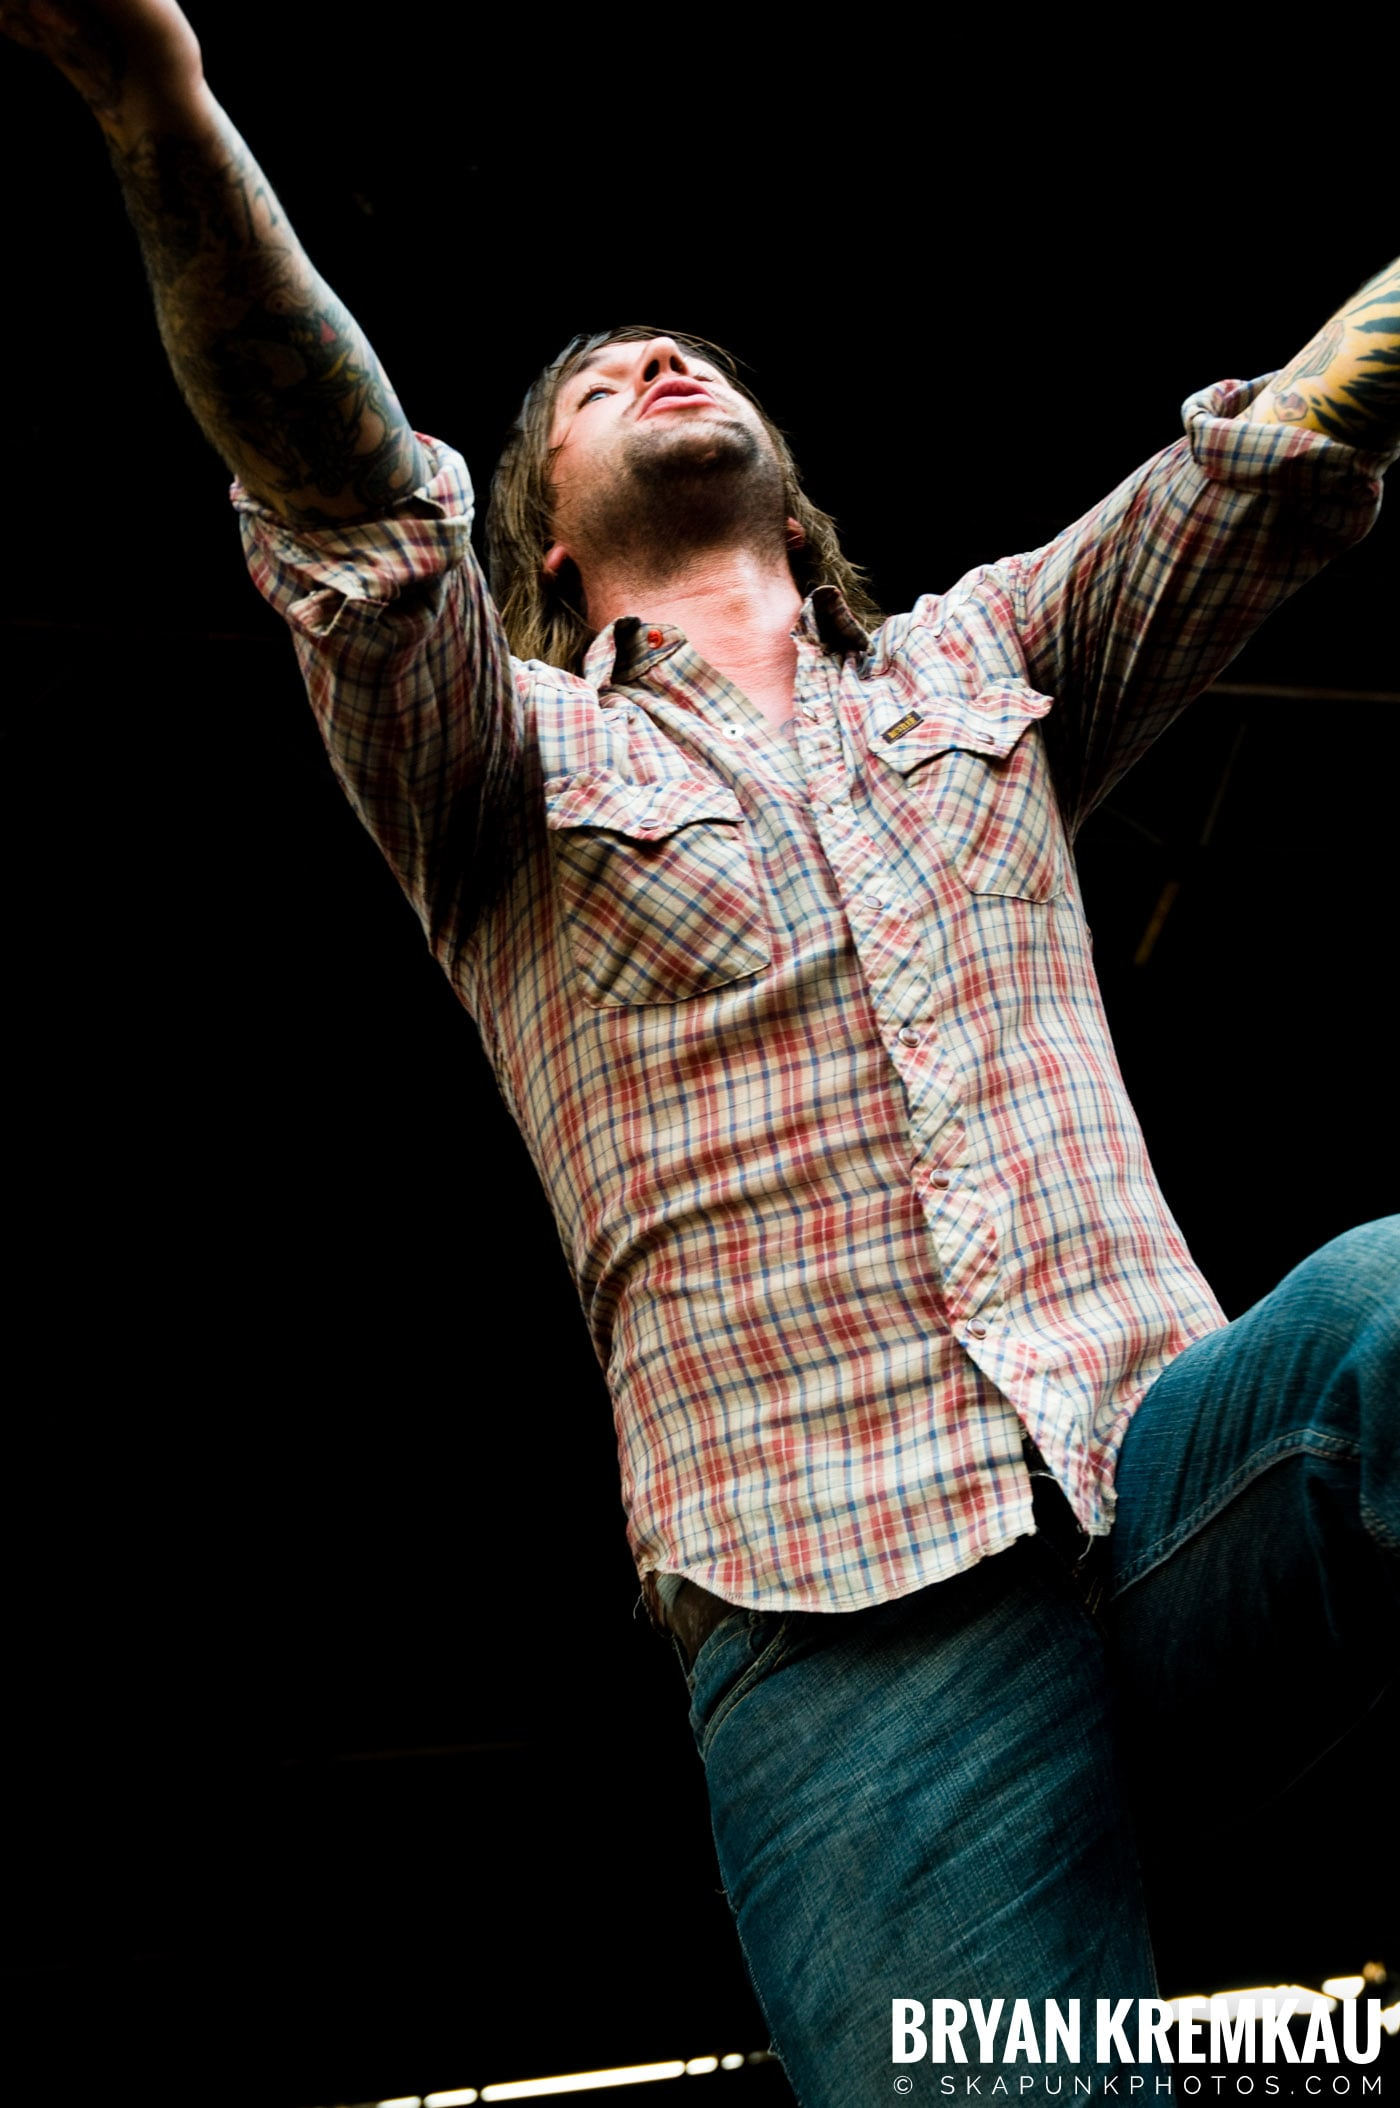 Everytime I Die @ Warped Tour 08, Scranton PA - 7.27.08 (4)